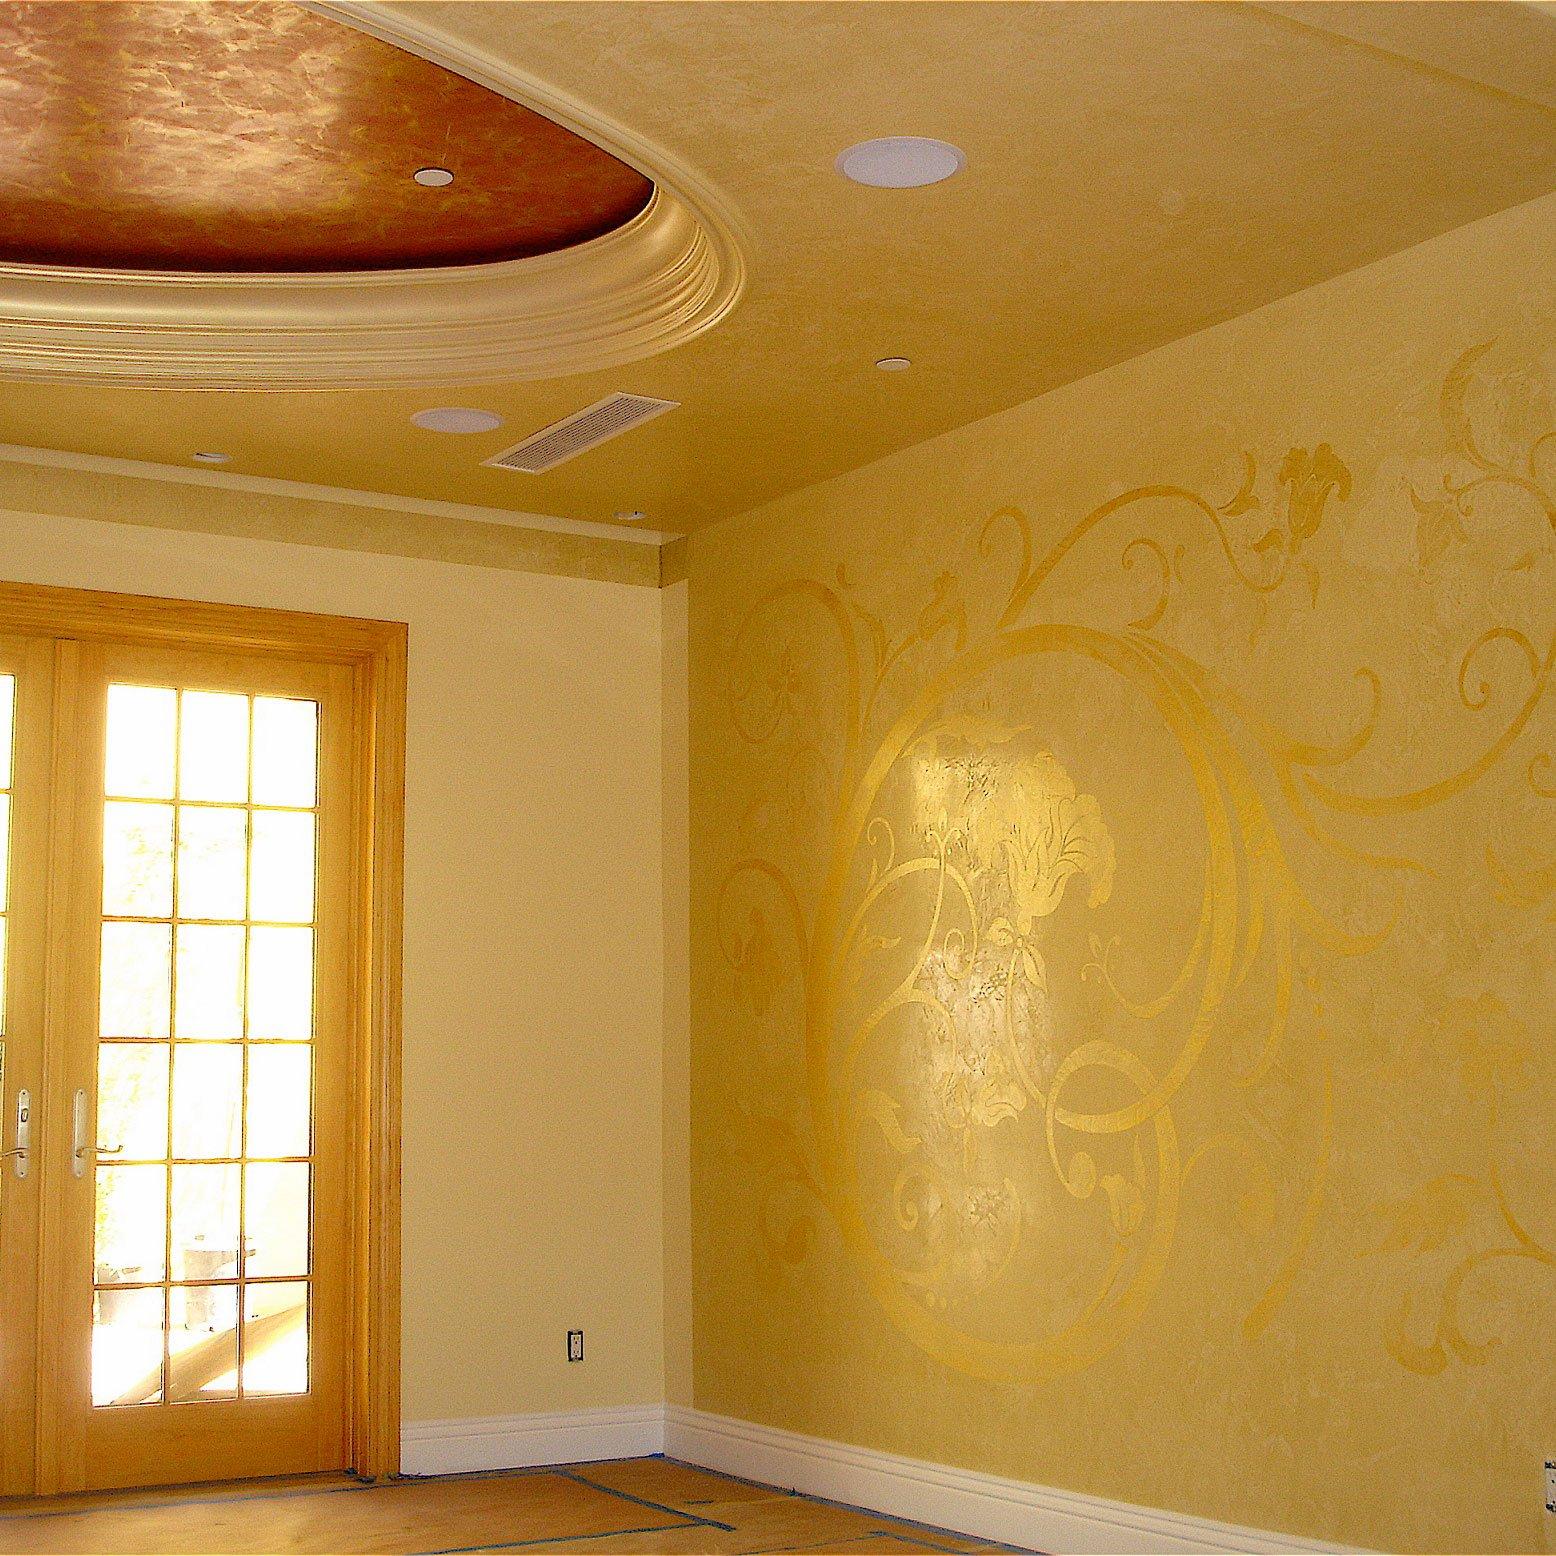 Stucco Lamundo Venetian Plaster with Metallic Wax   Meoded Paint ...